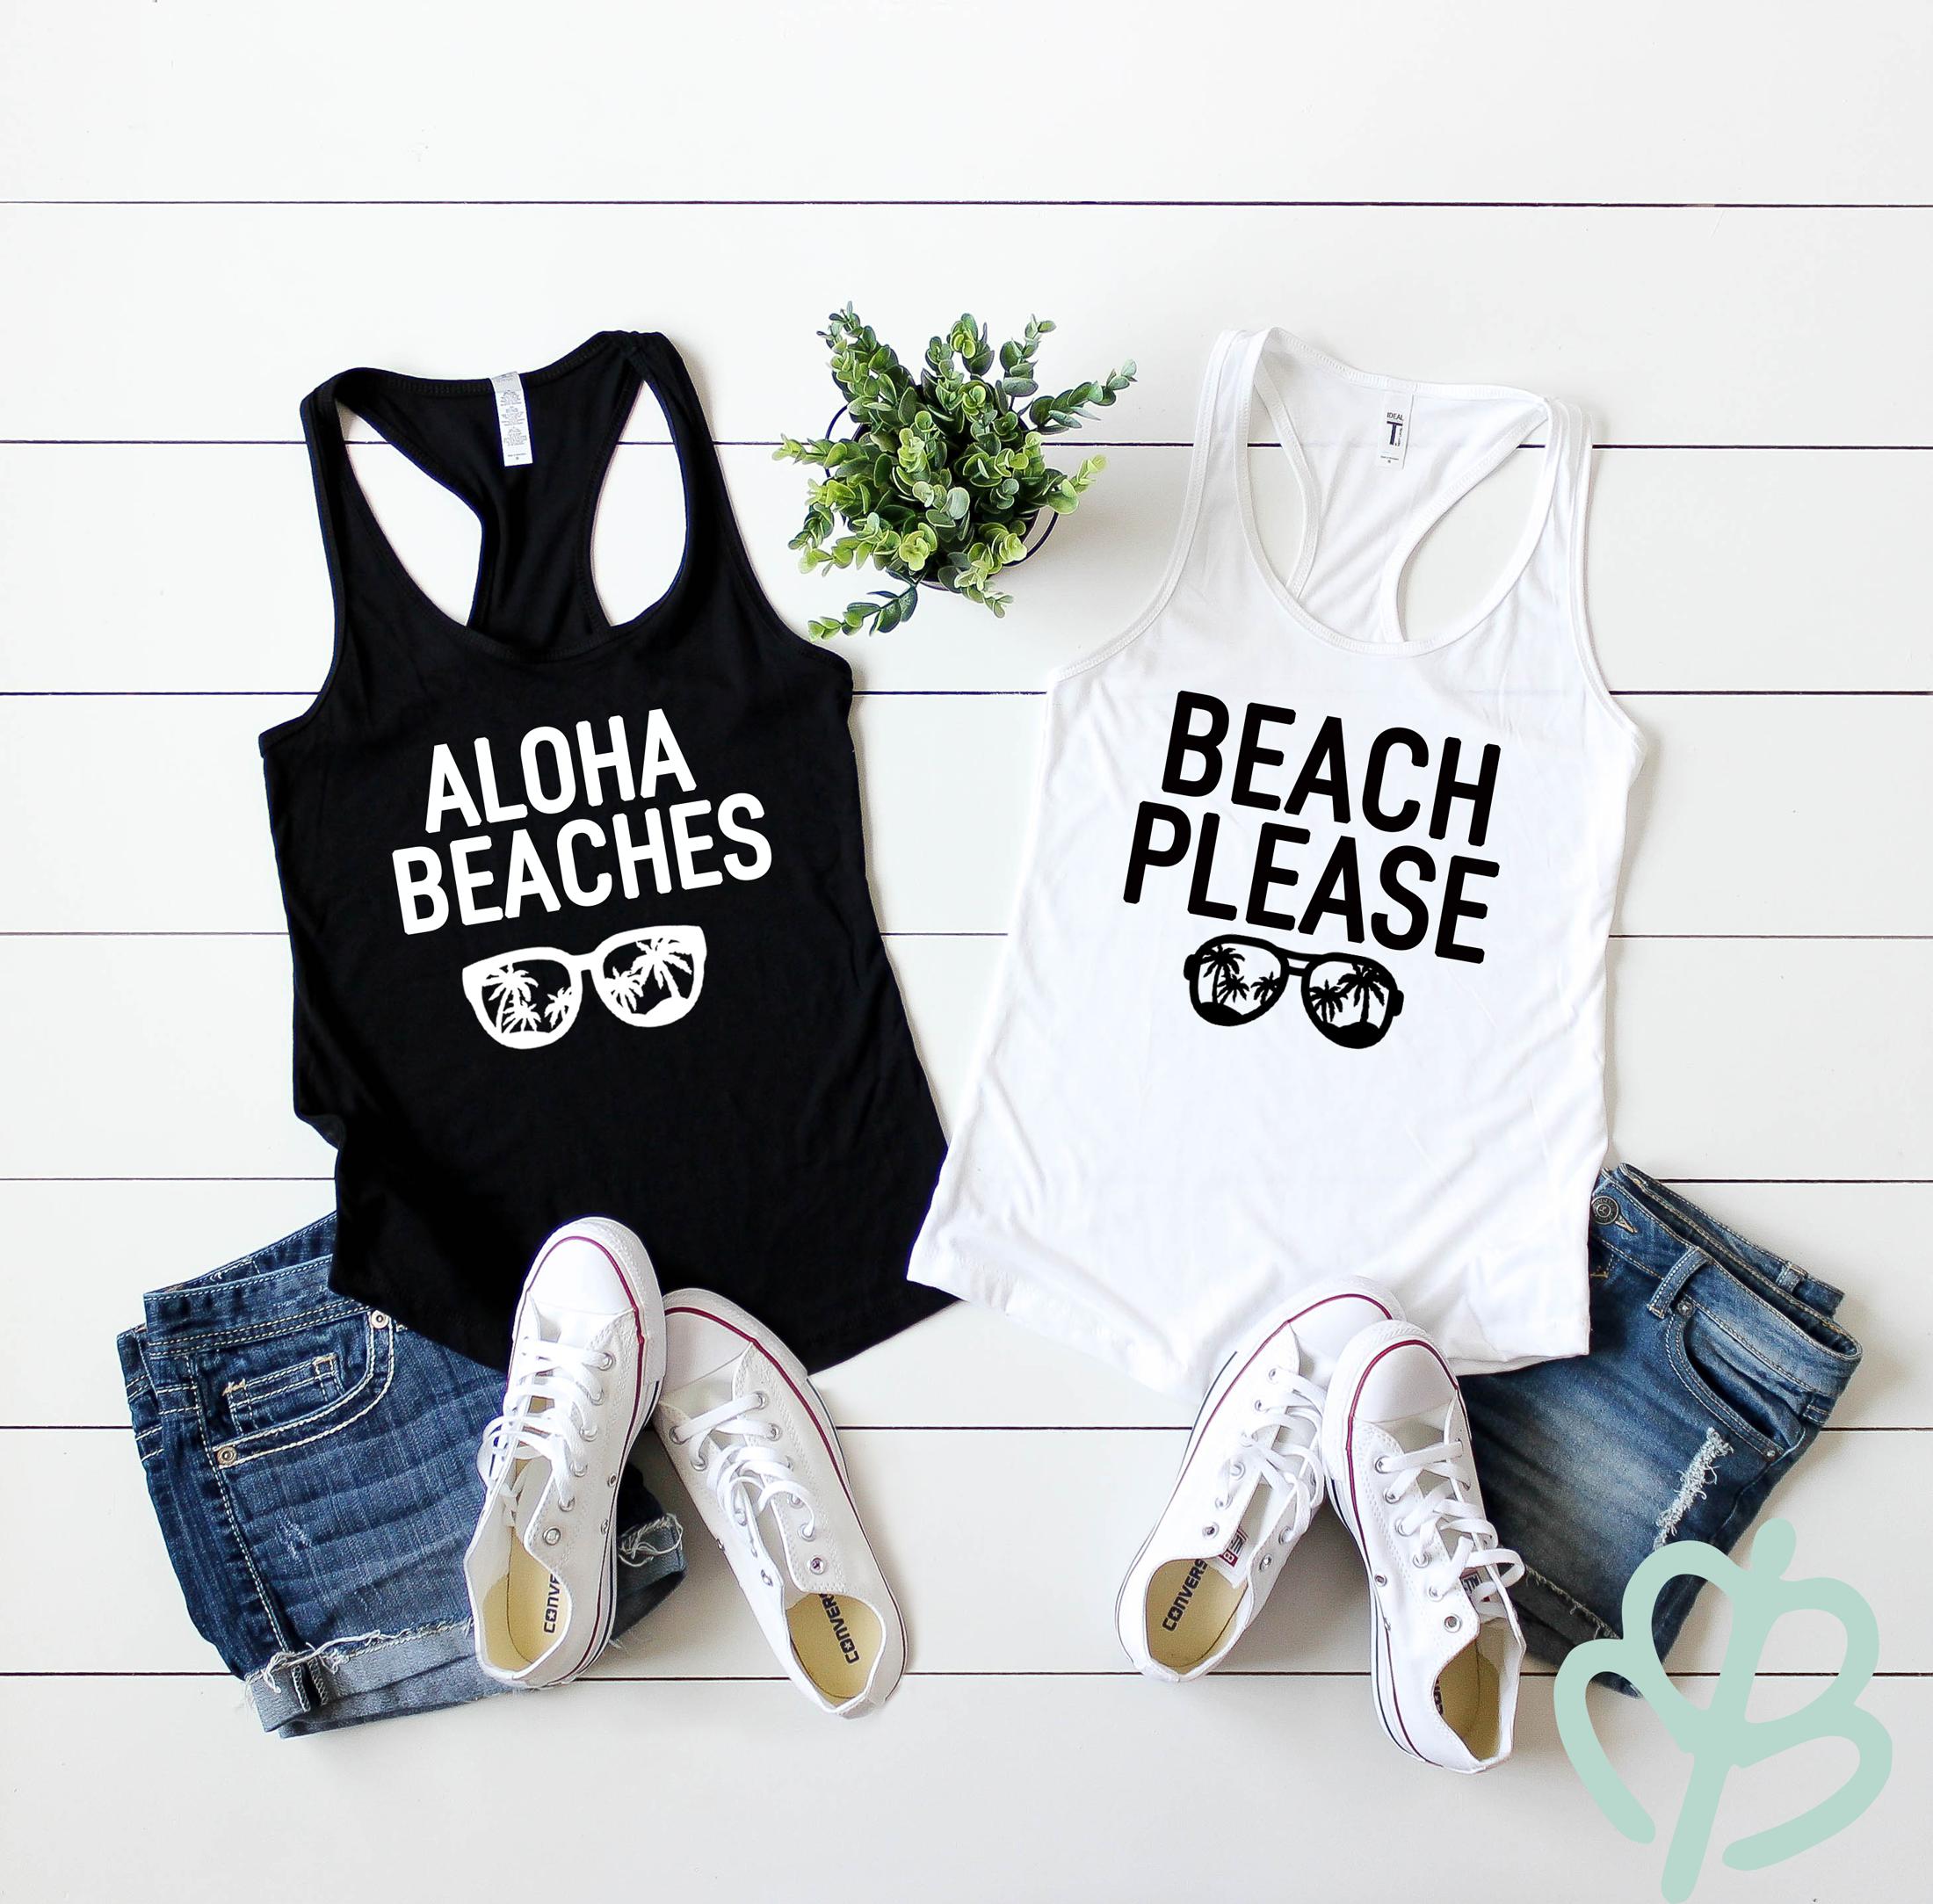 Aloha-beaches,-beach-please--black-and-w